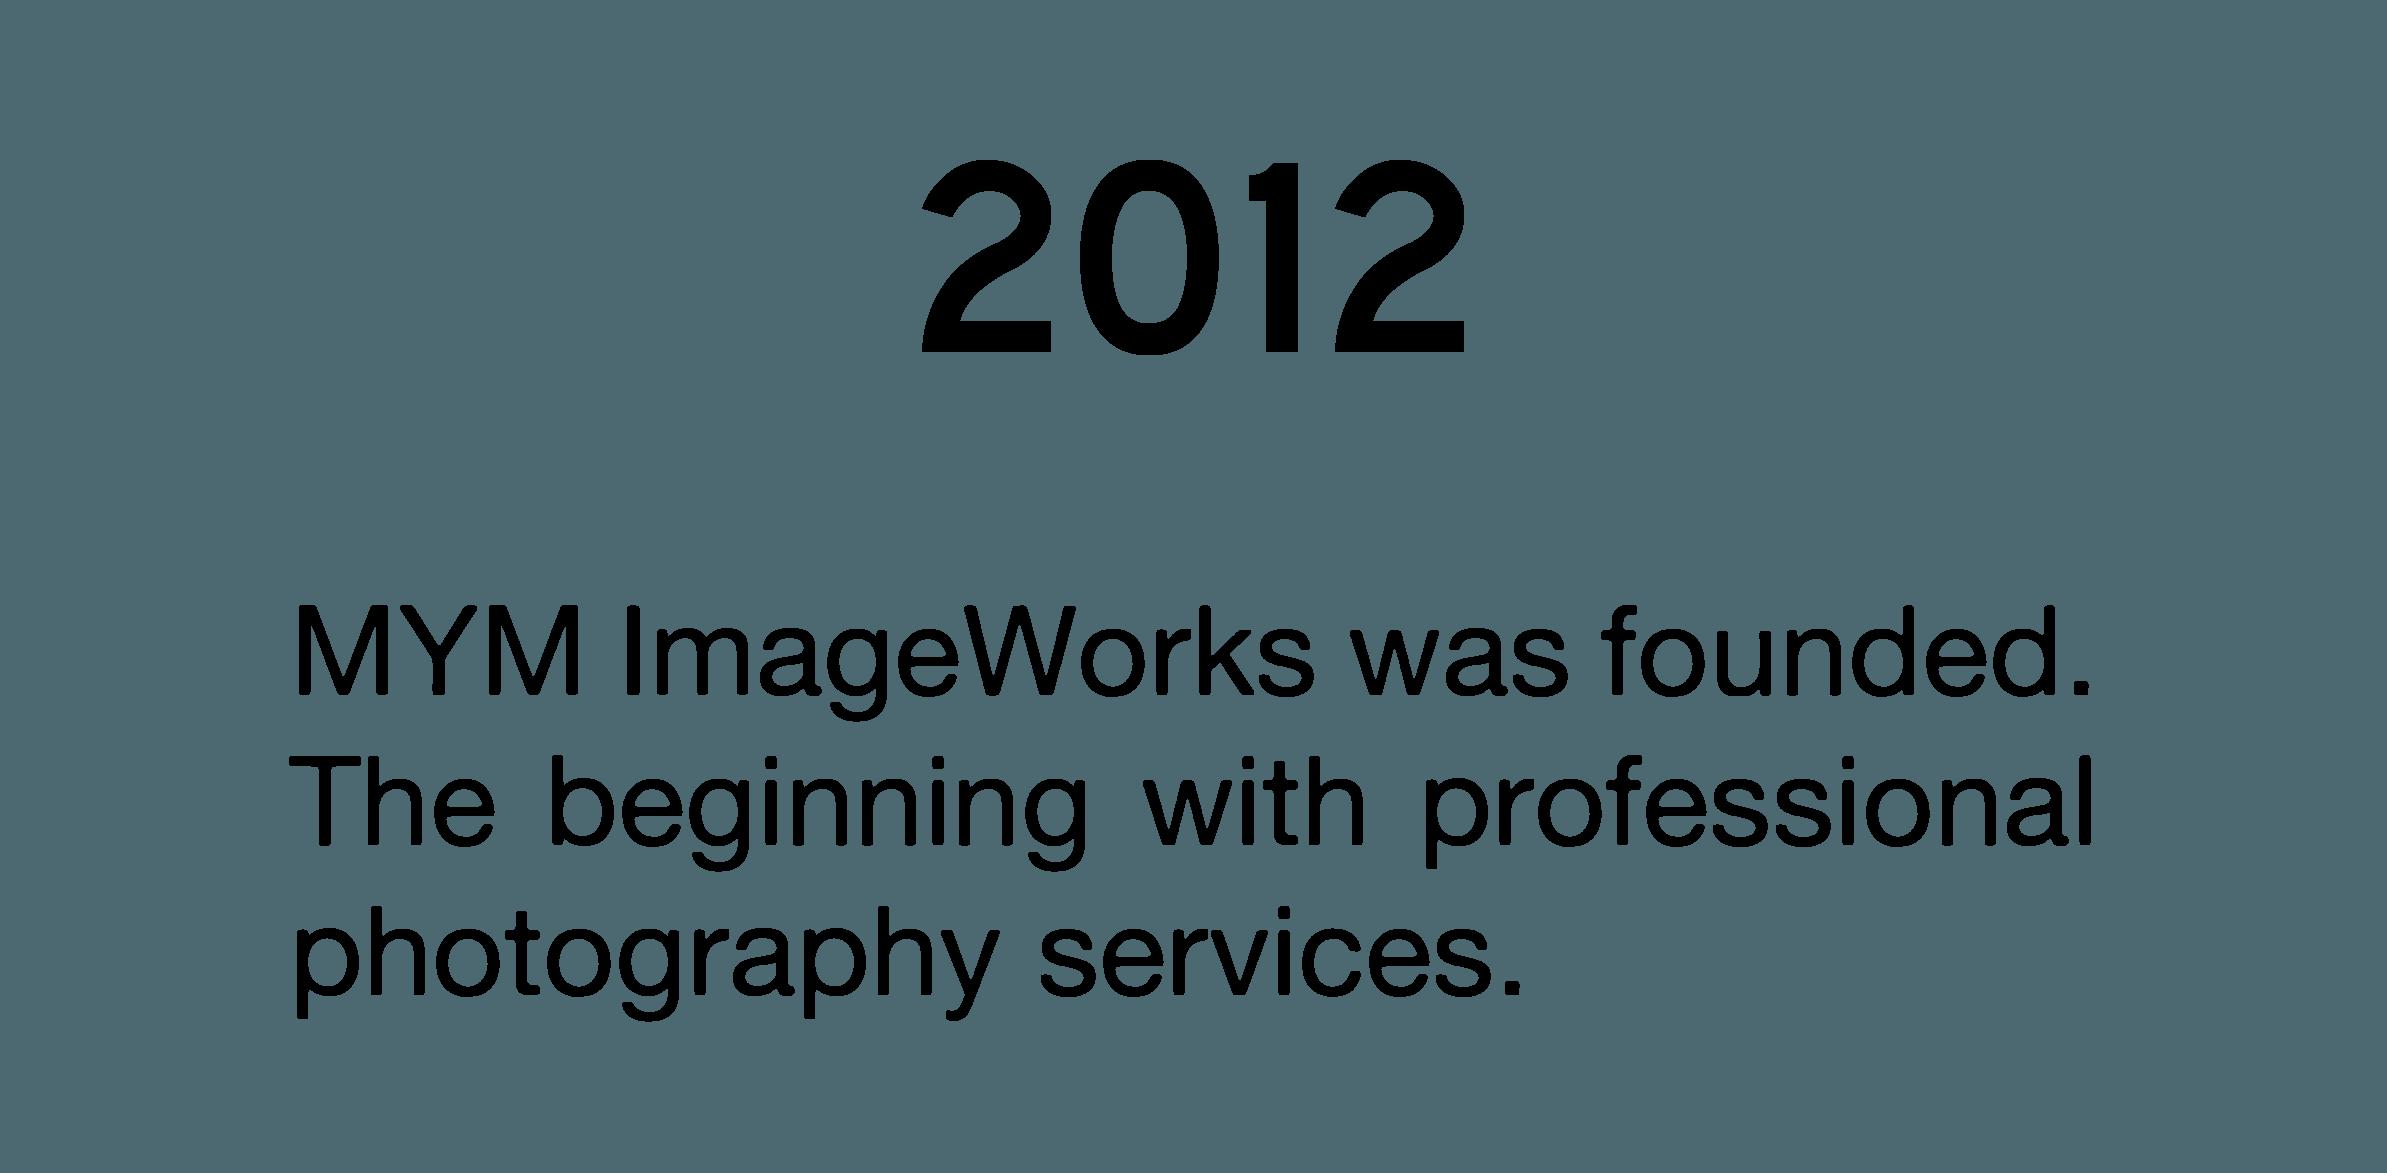 MYM Imageworks 2012